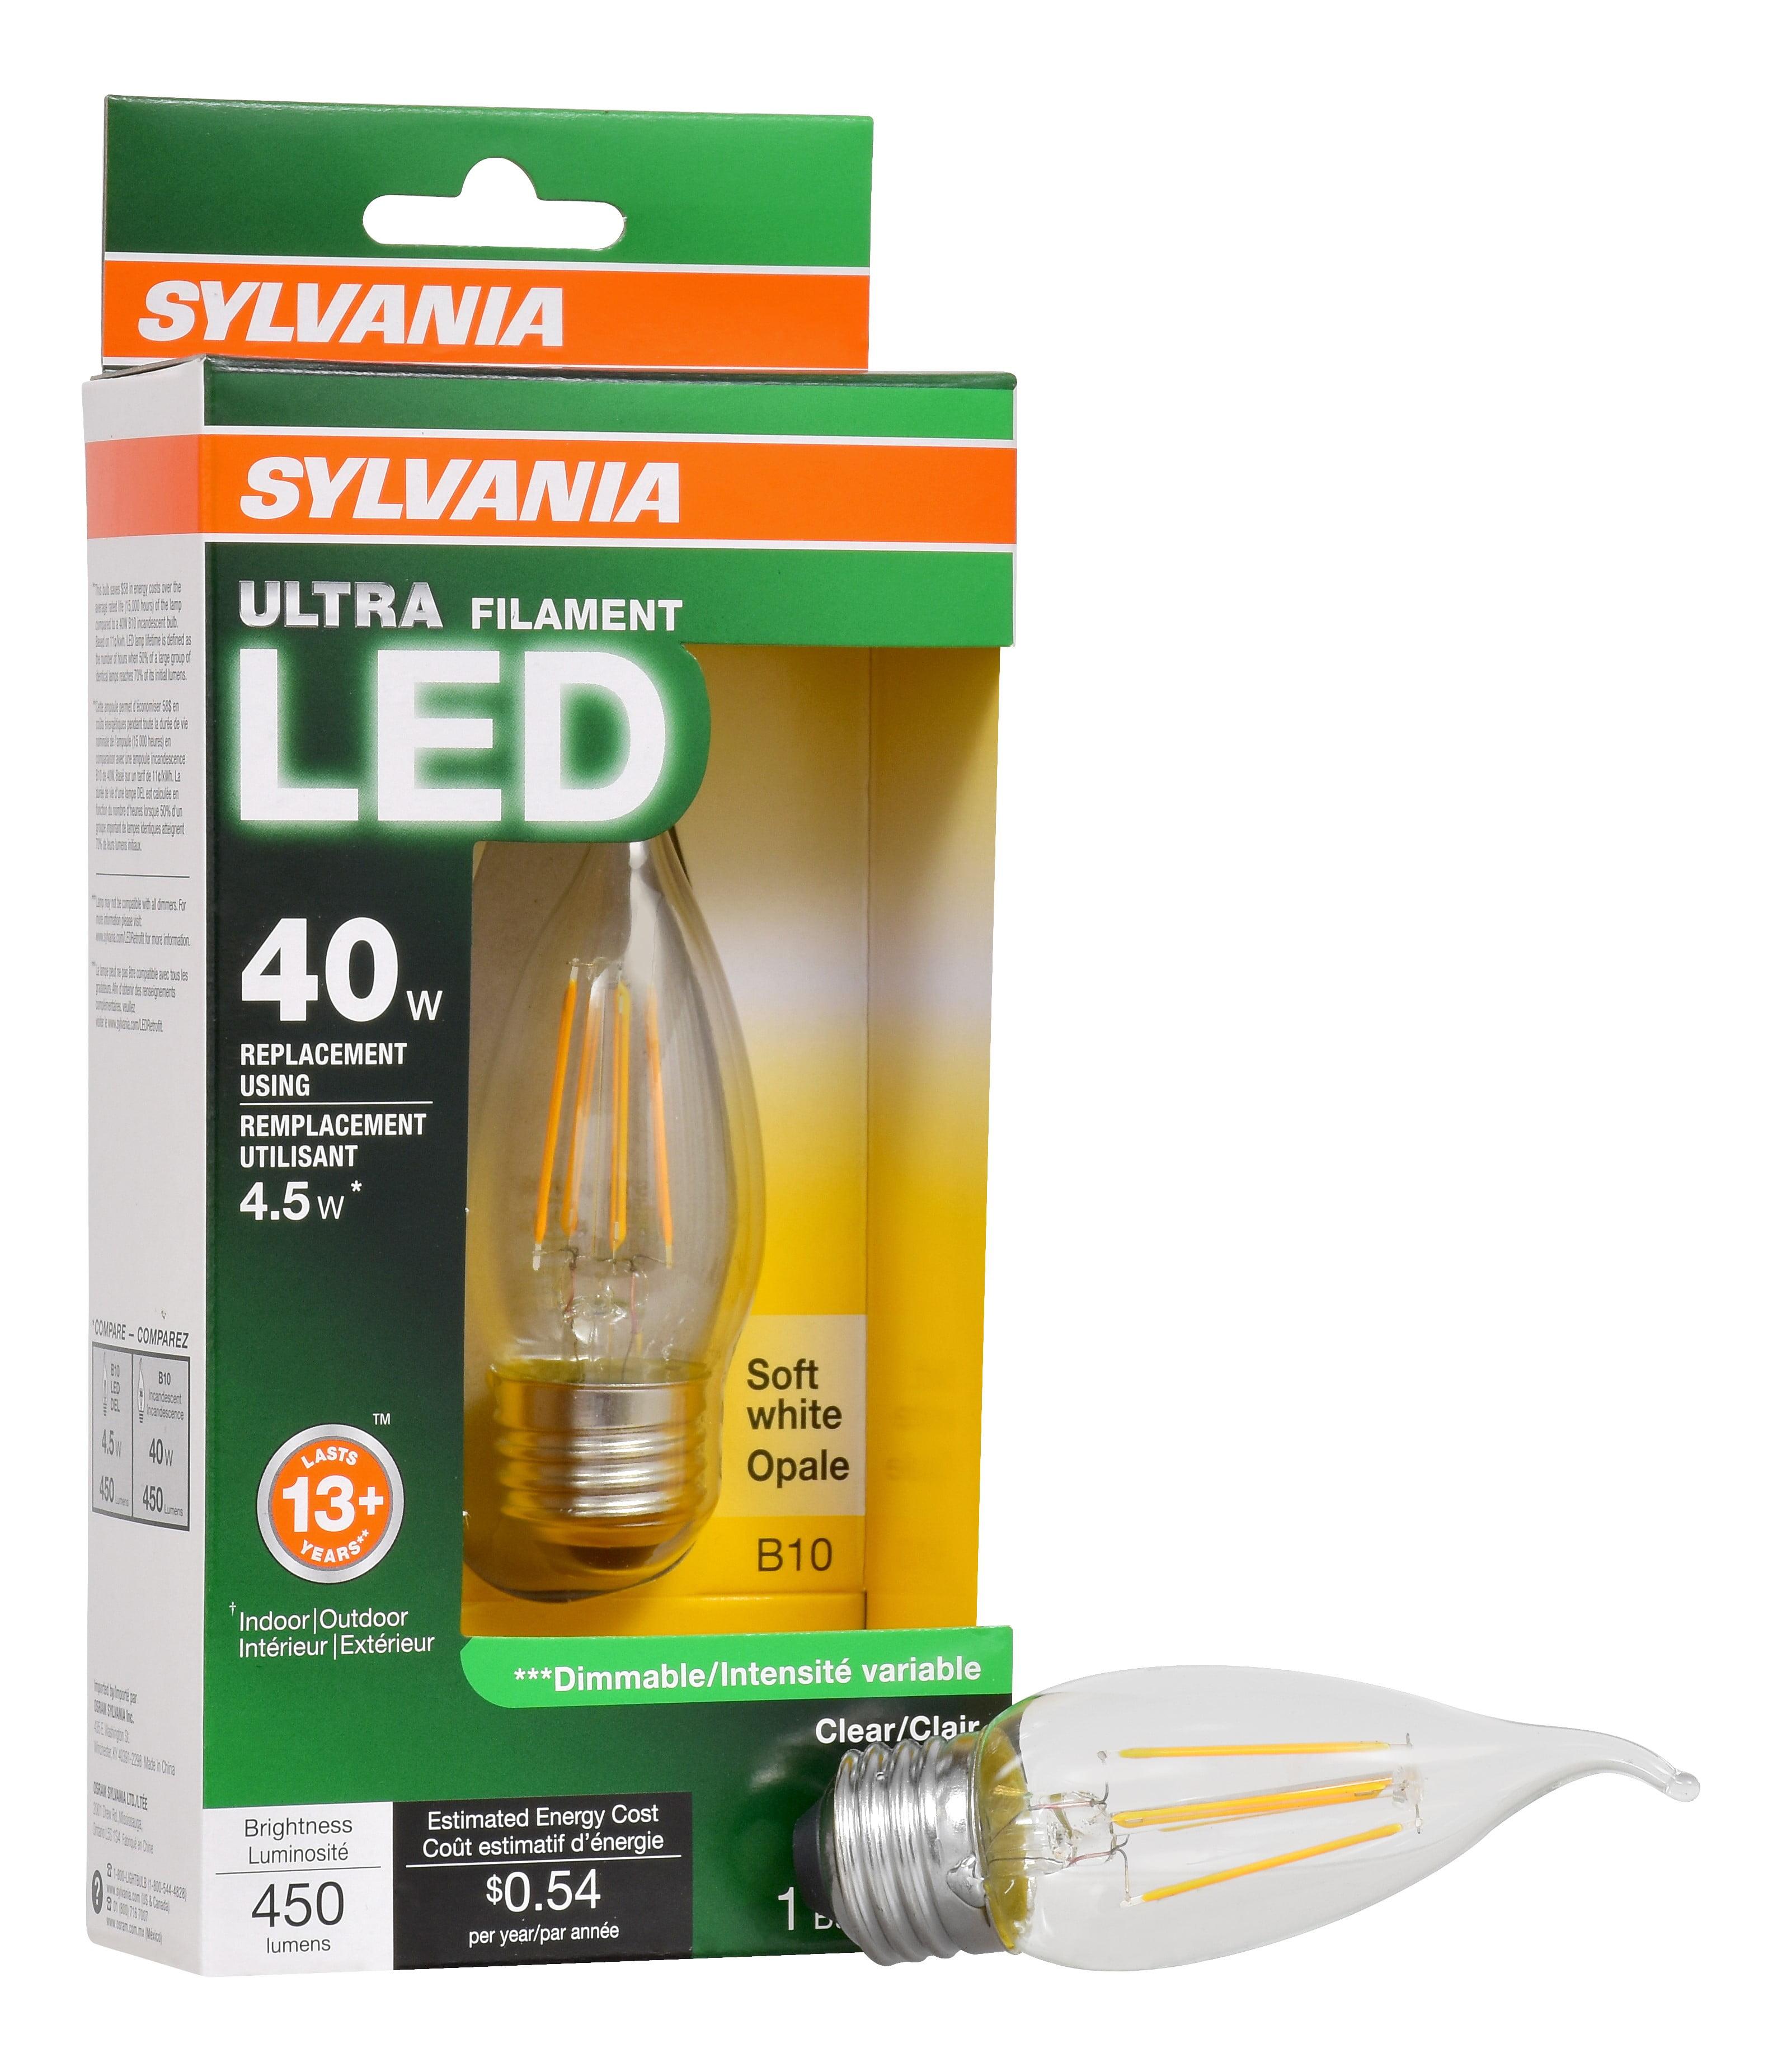 E12 Led Walmart: Sylvania Vintage LED Light Bulb, 40W Equivalent, B10